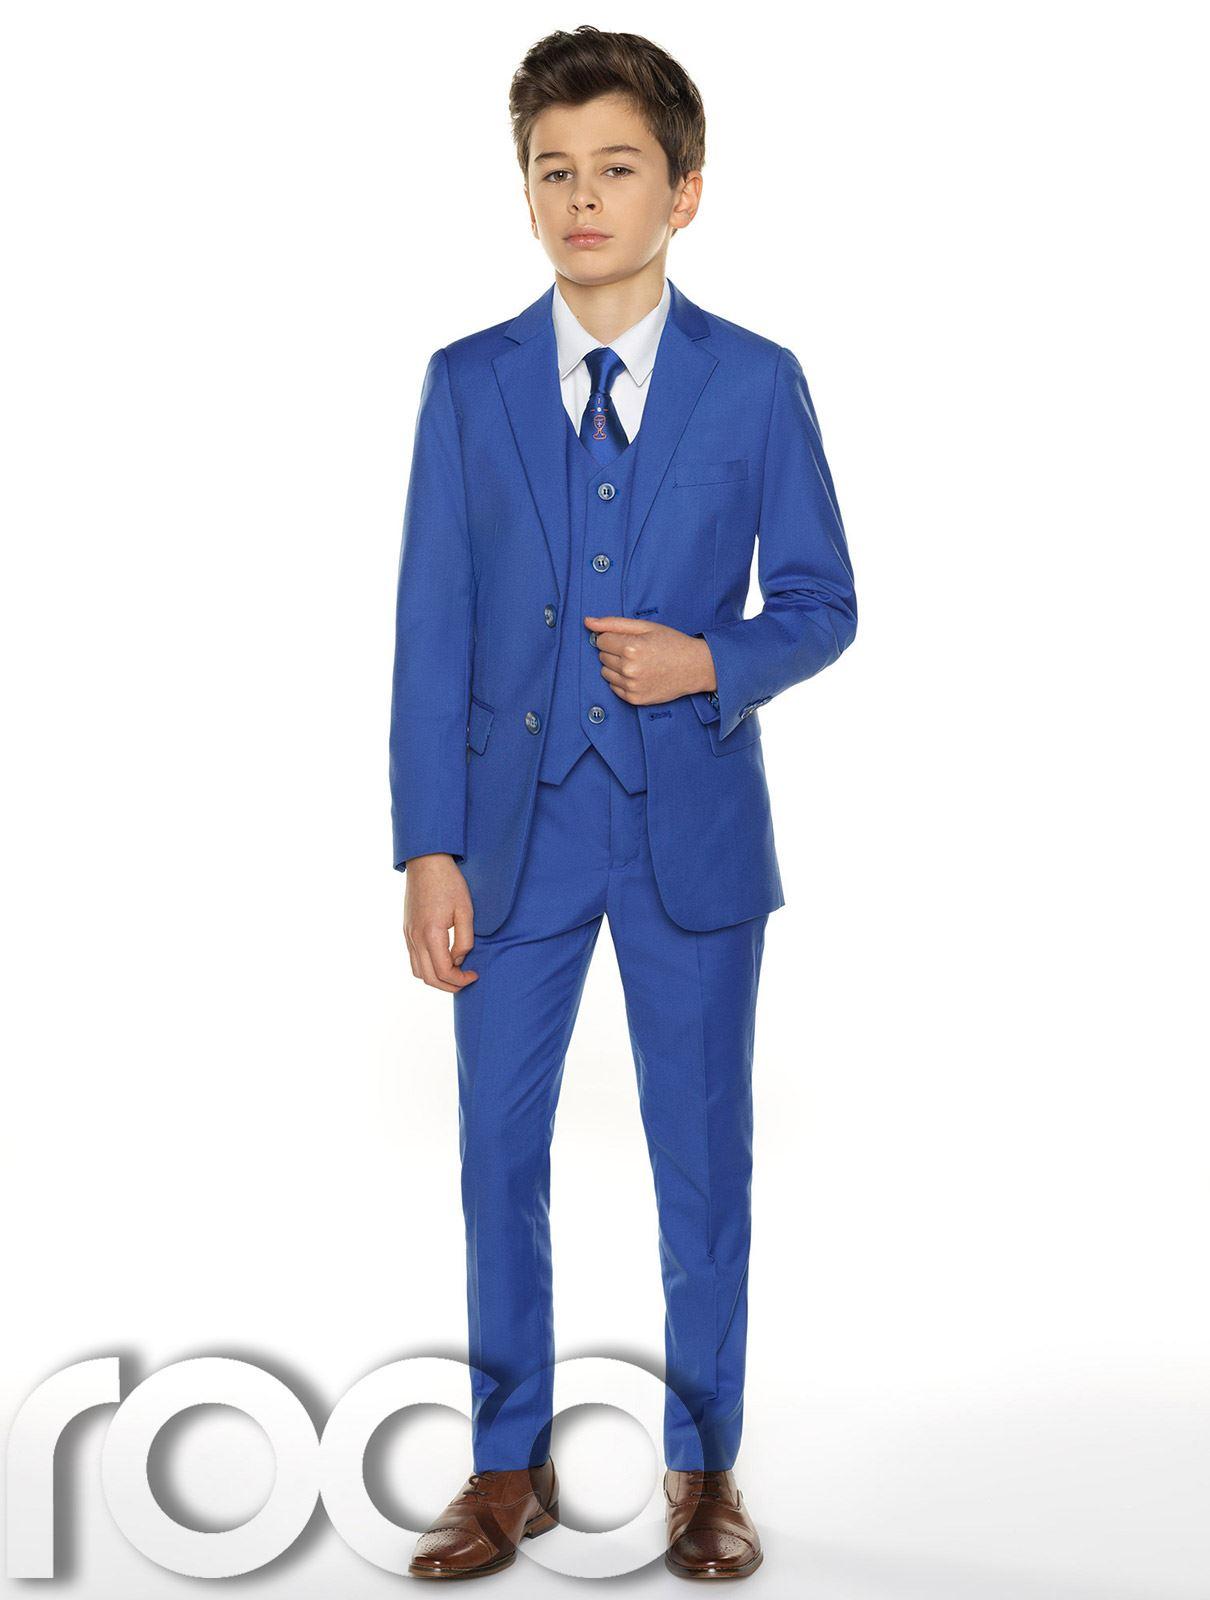 Garcons-Costume-Bleu-Communion-Costume-Bleu-Communion-Costume miniature 6